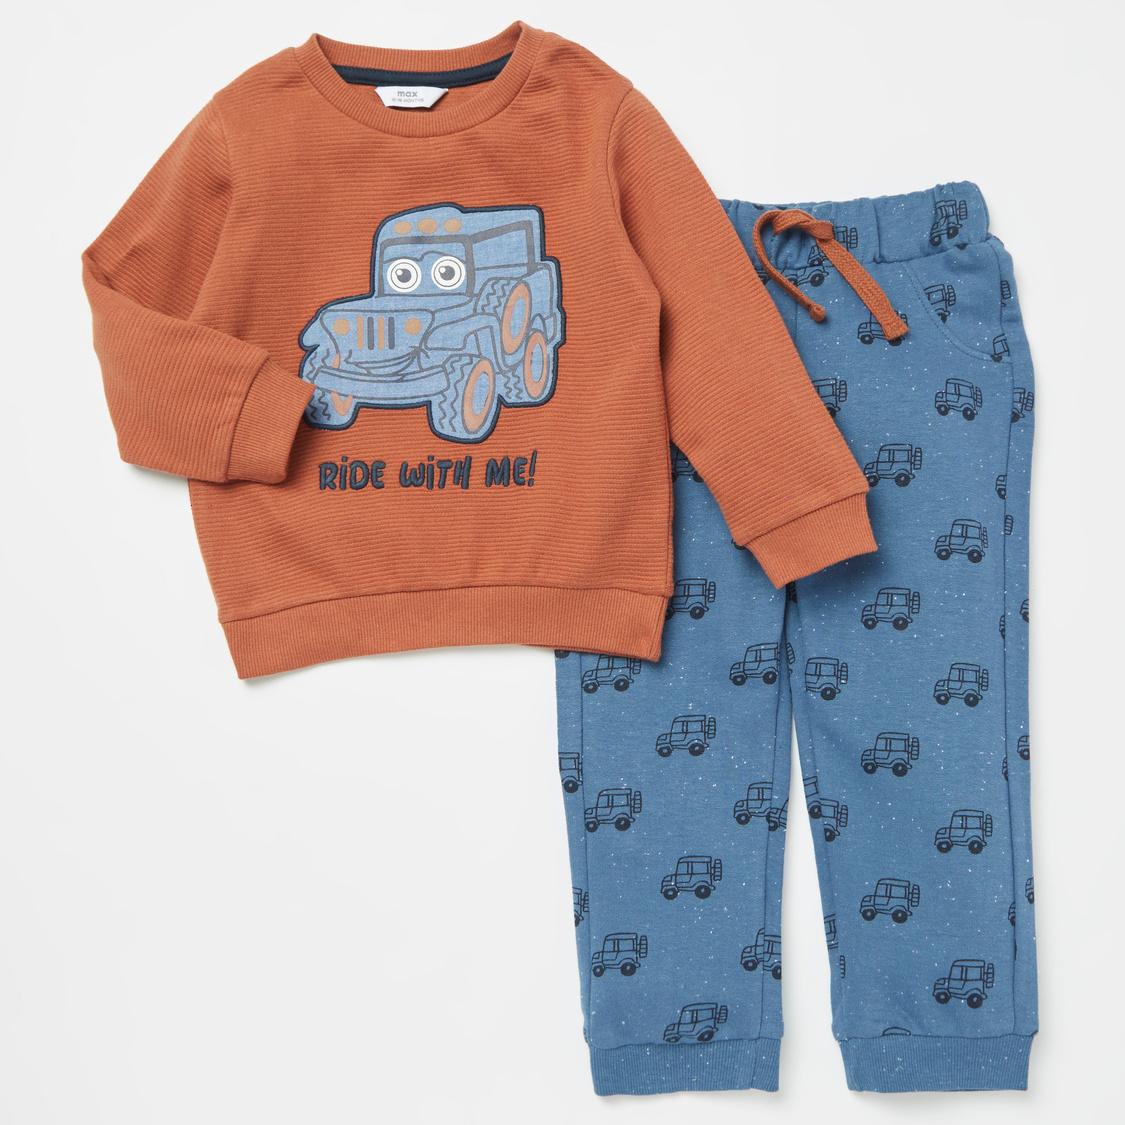 Embroidered Long Sleeves Sweatshirt with All-Over Print Jog Pants Set